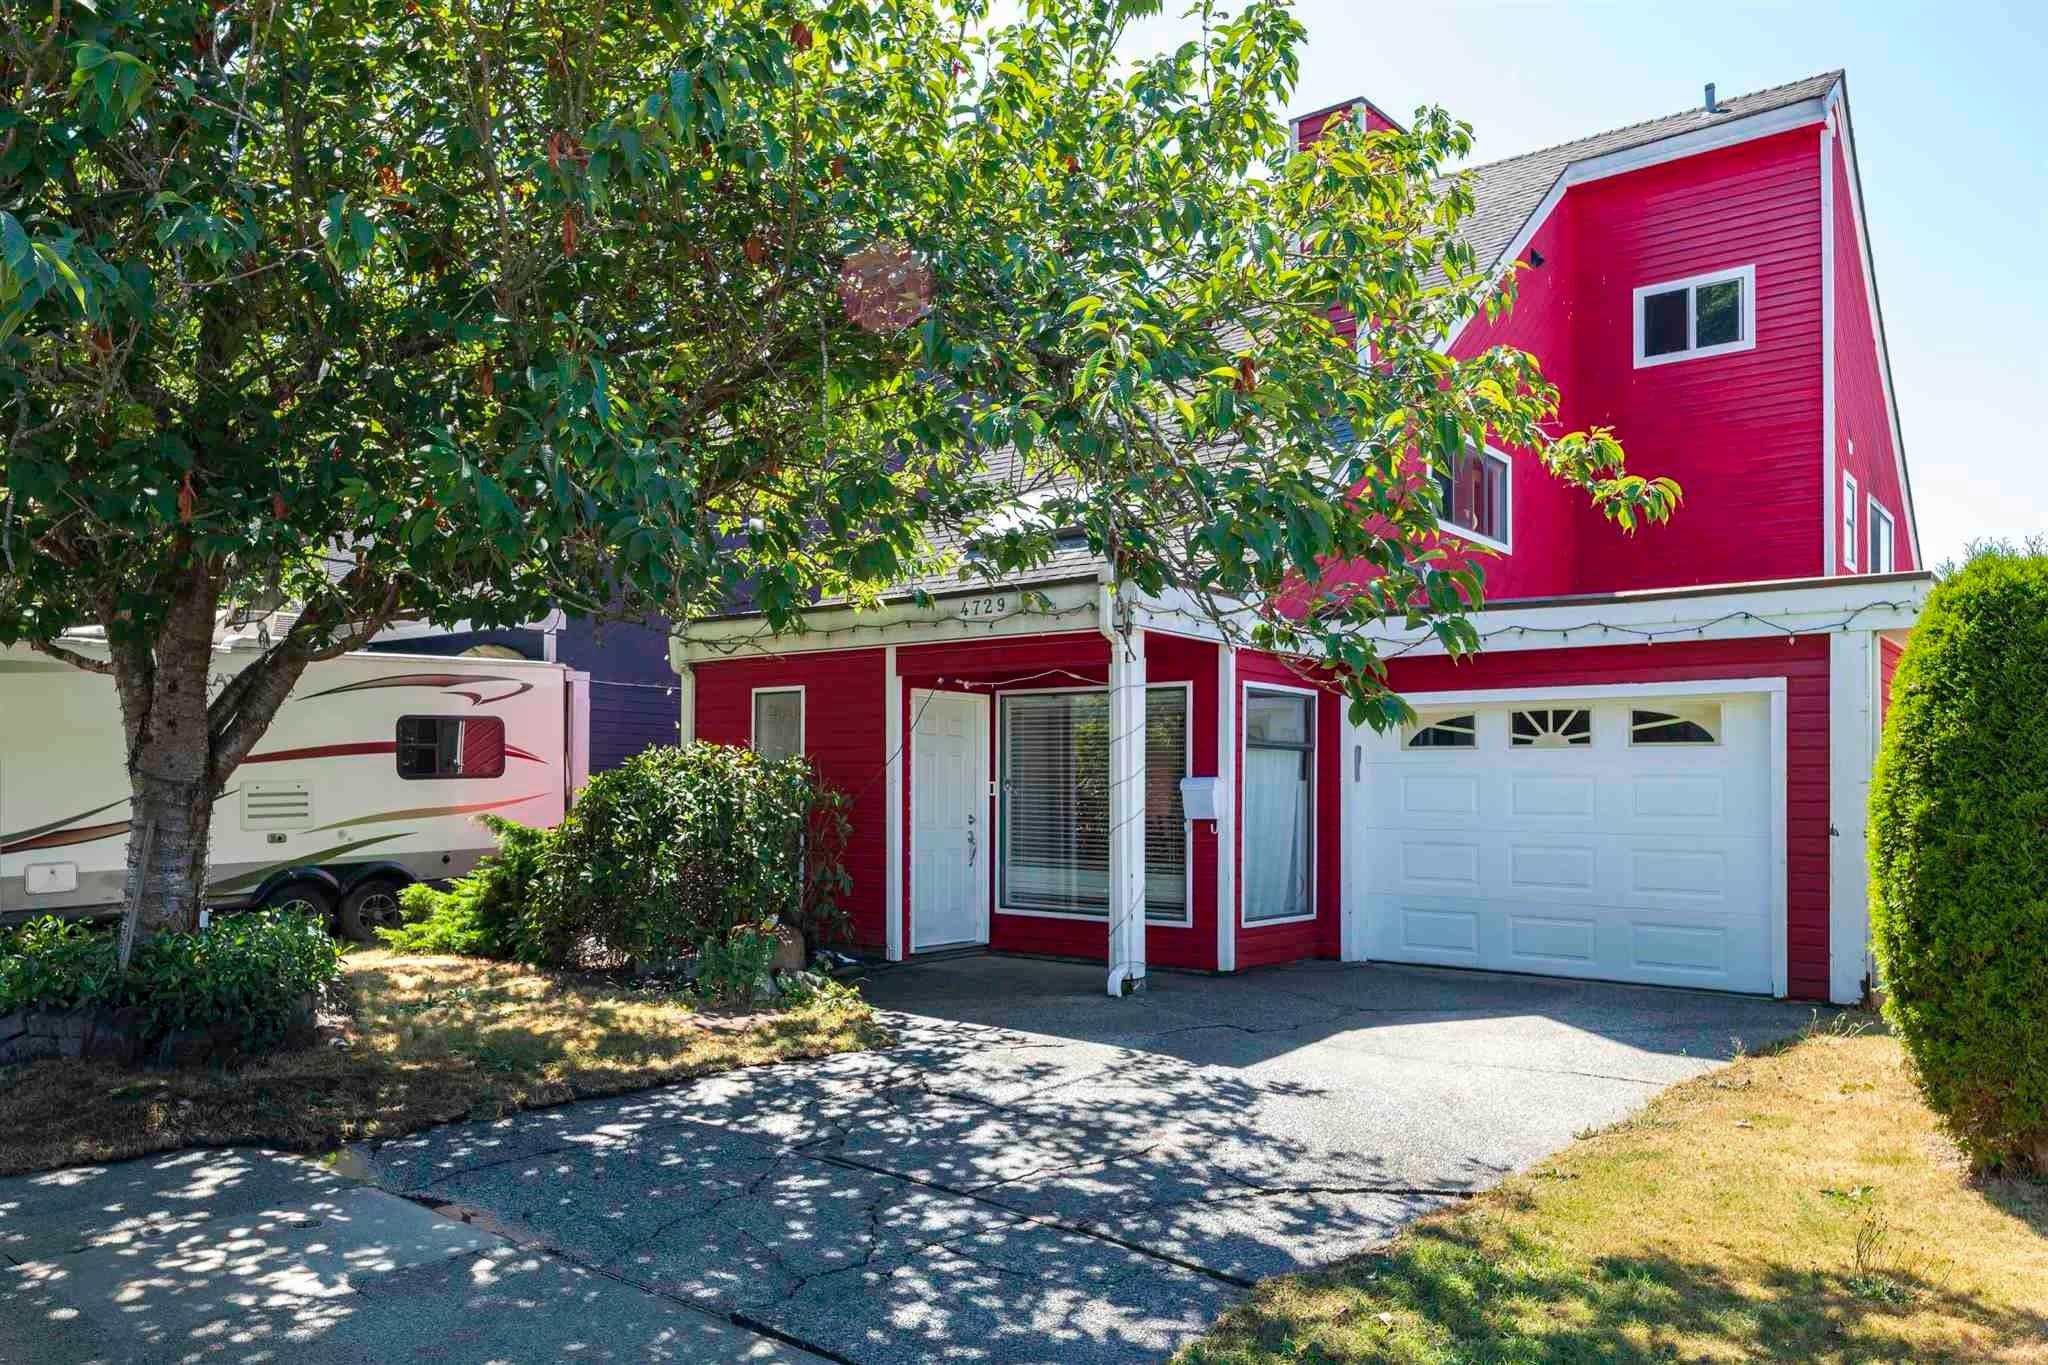 4729 48B STREET - Ladner Elementary House/Single Family for sale, 4 Bedrooms (R2603641)